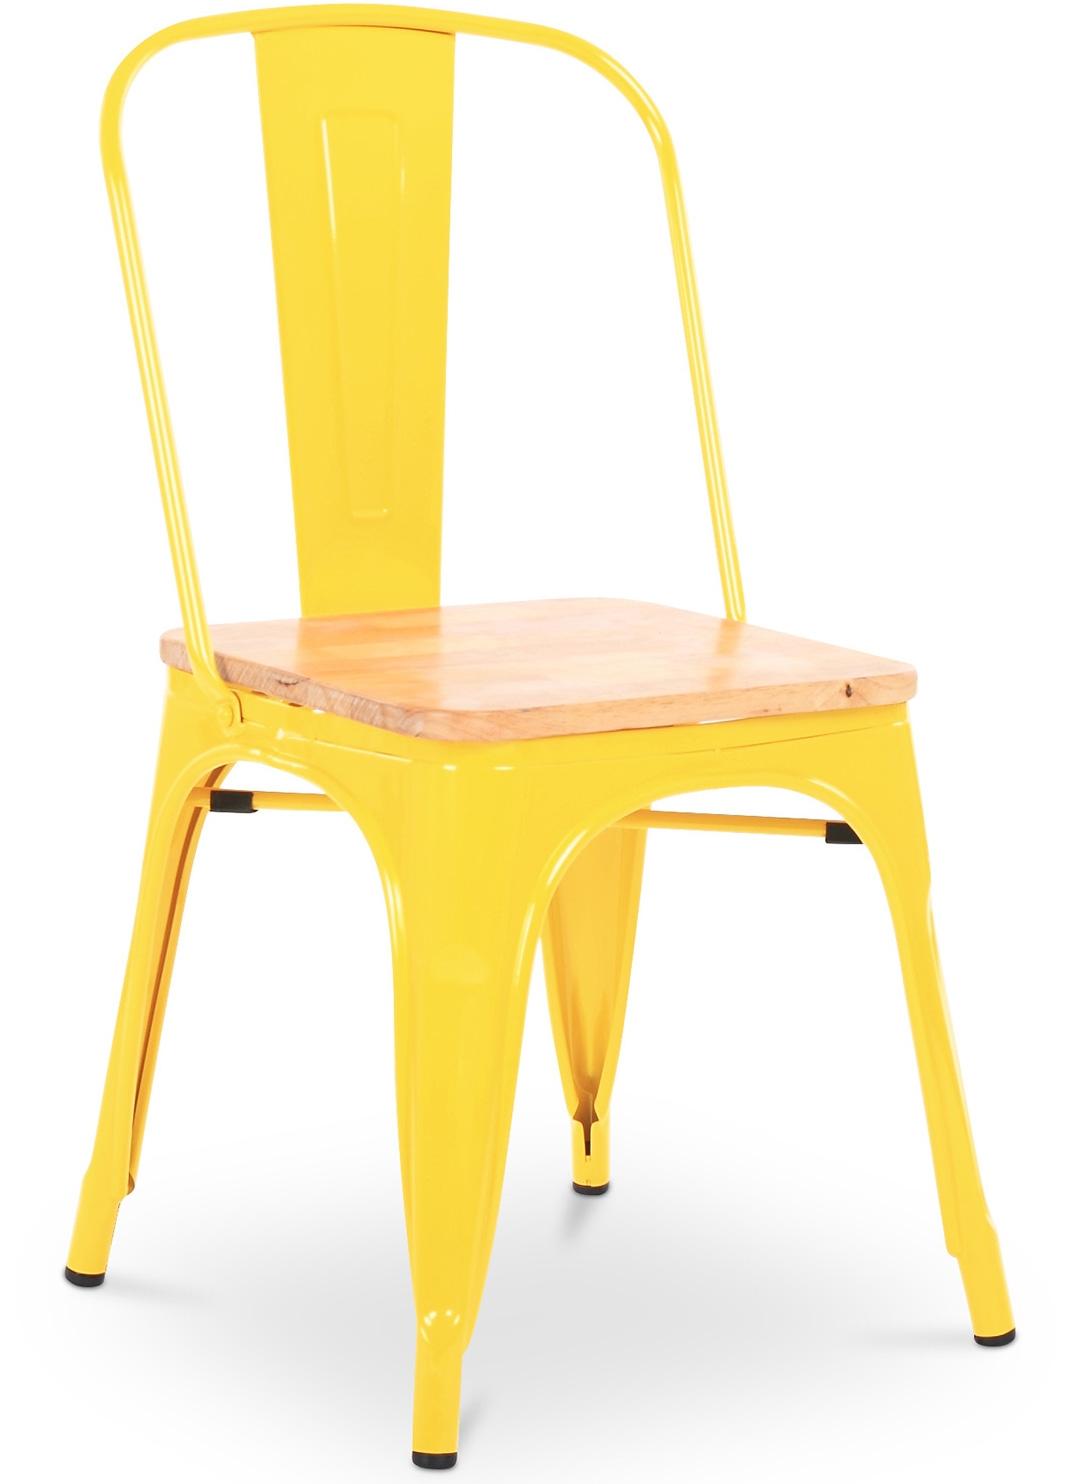 Chaise m tal jaune assise bois clair industriel for Chaise hauteur assise 48